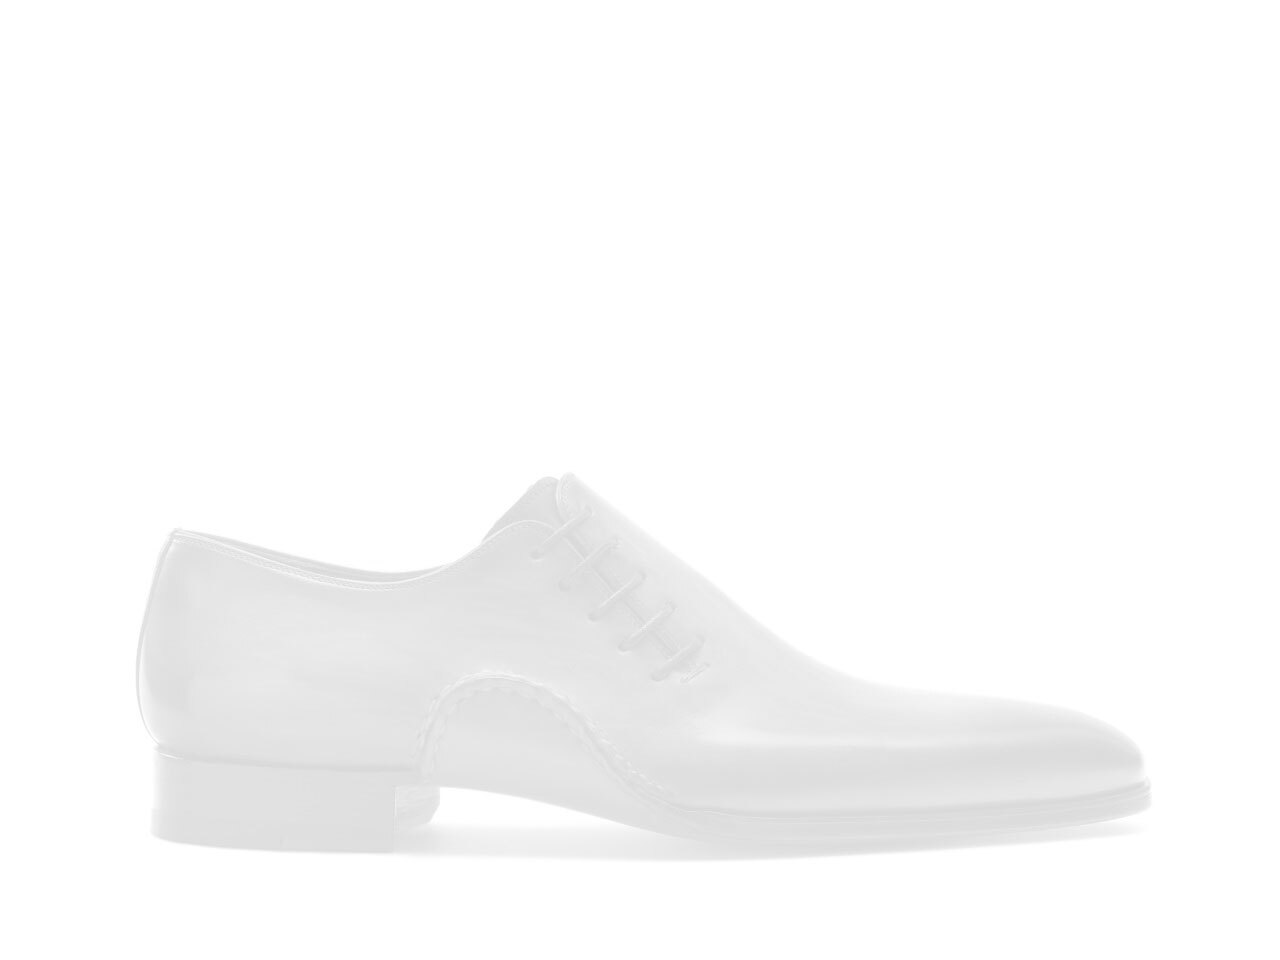 Pair of the Magnanni Ibiza Black Men's Sneakers